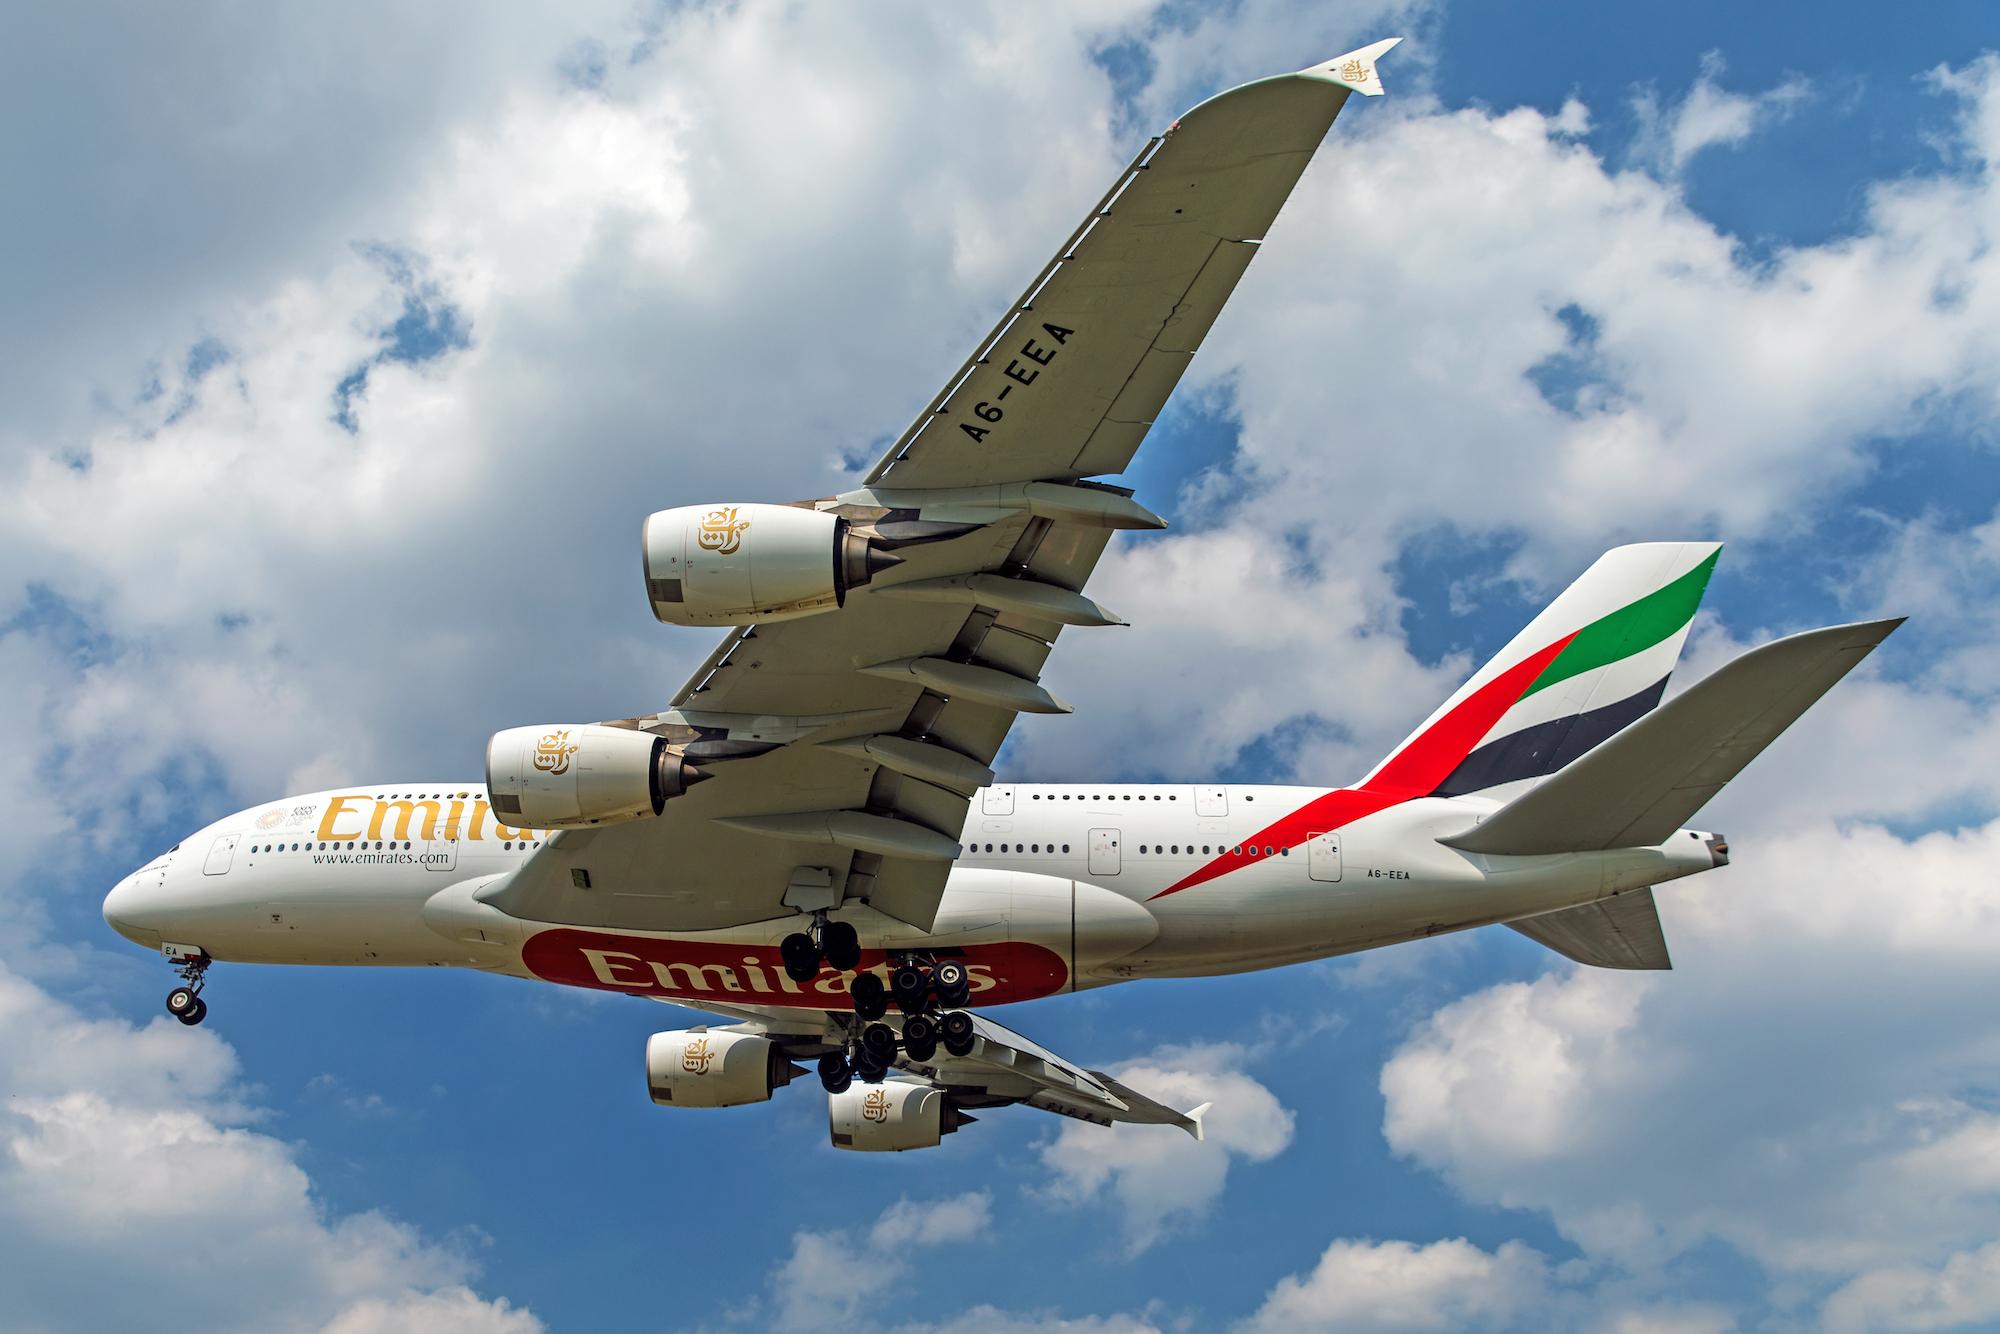 Dubai to Casablanca on Emirates to be resumed